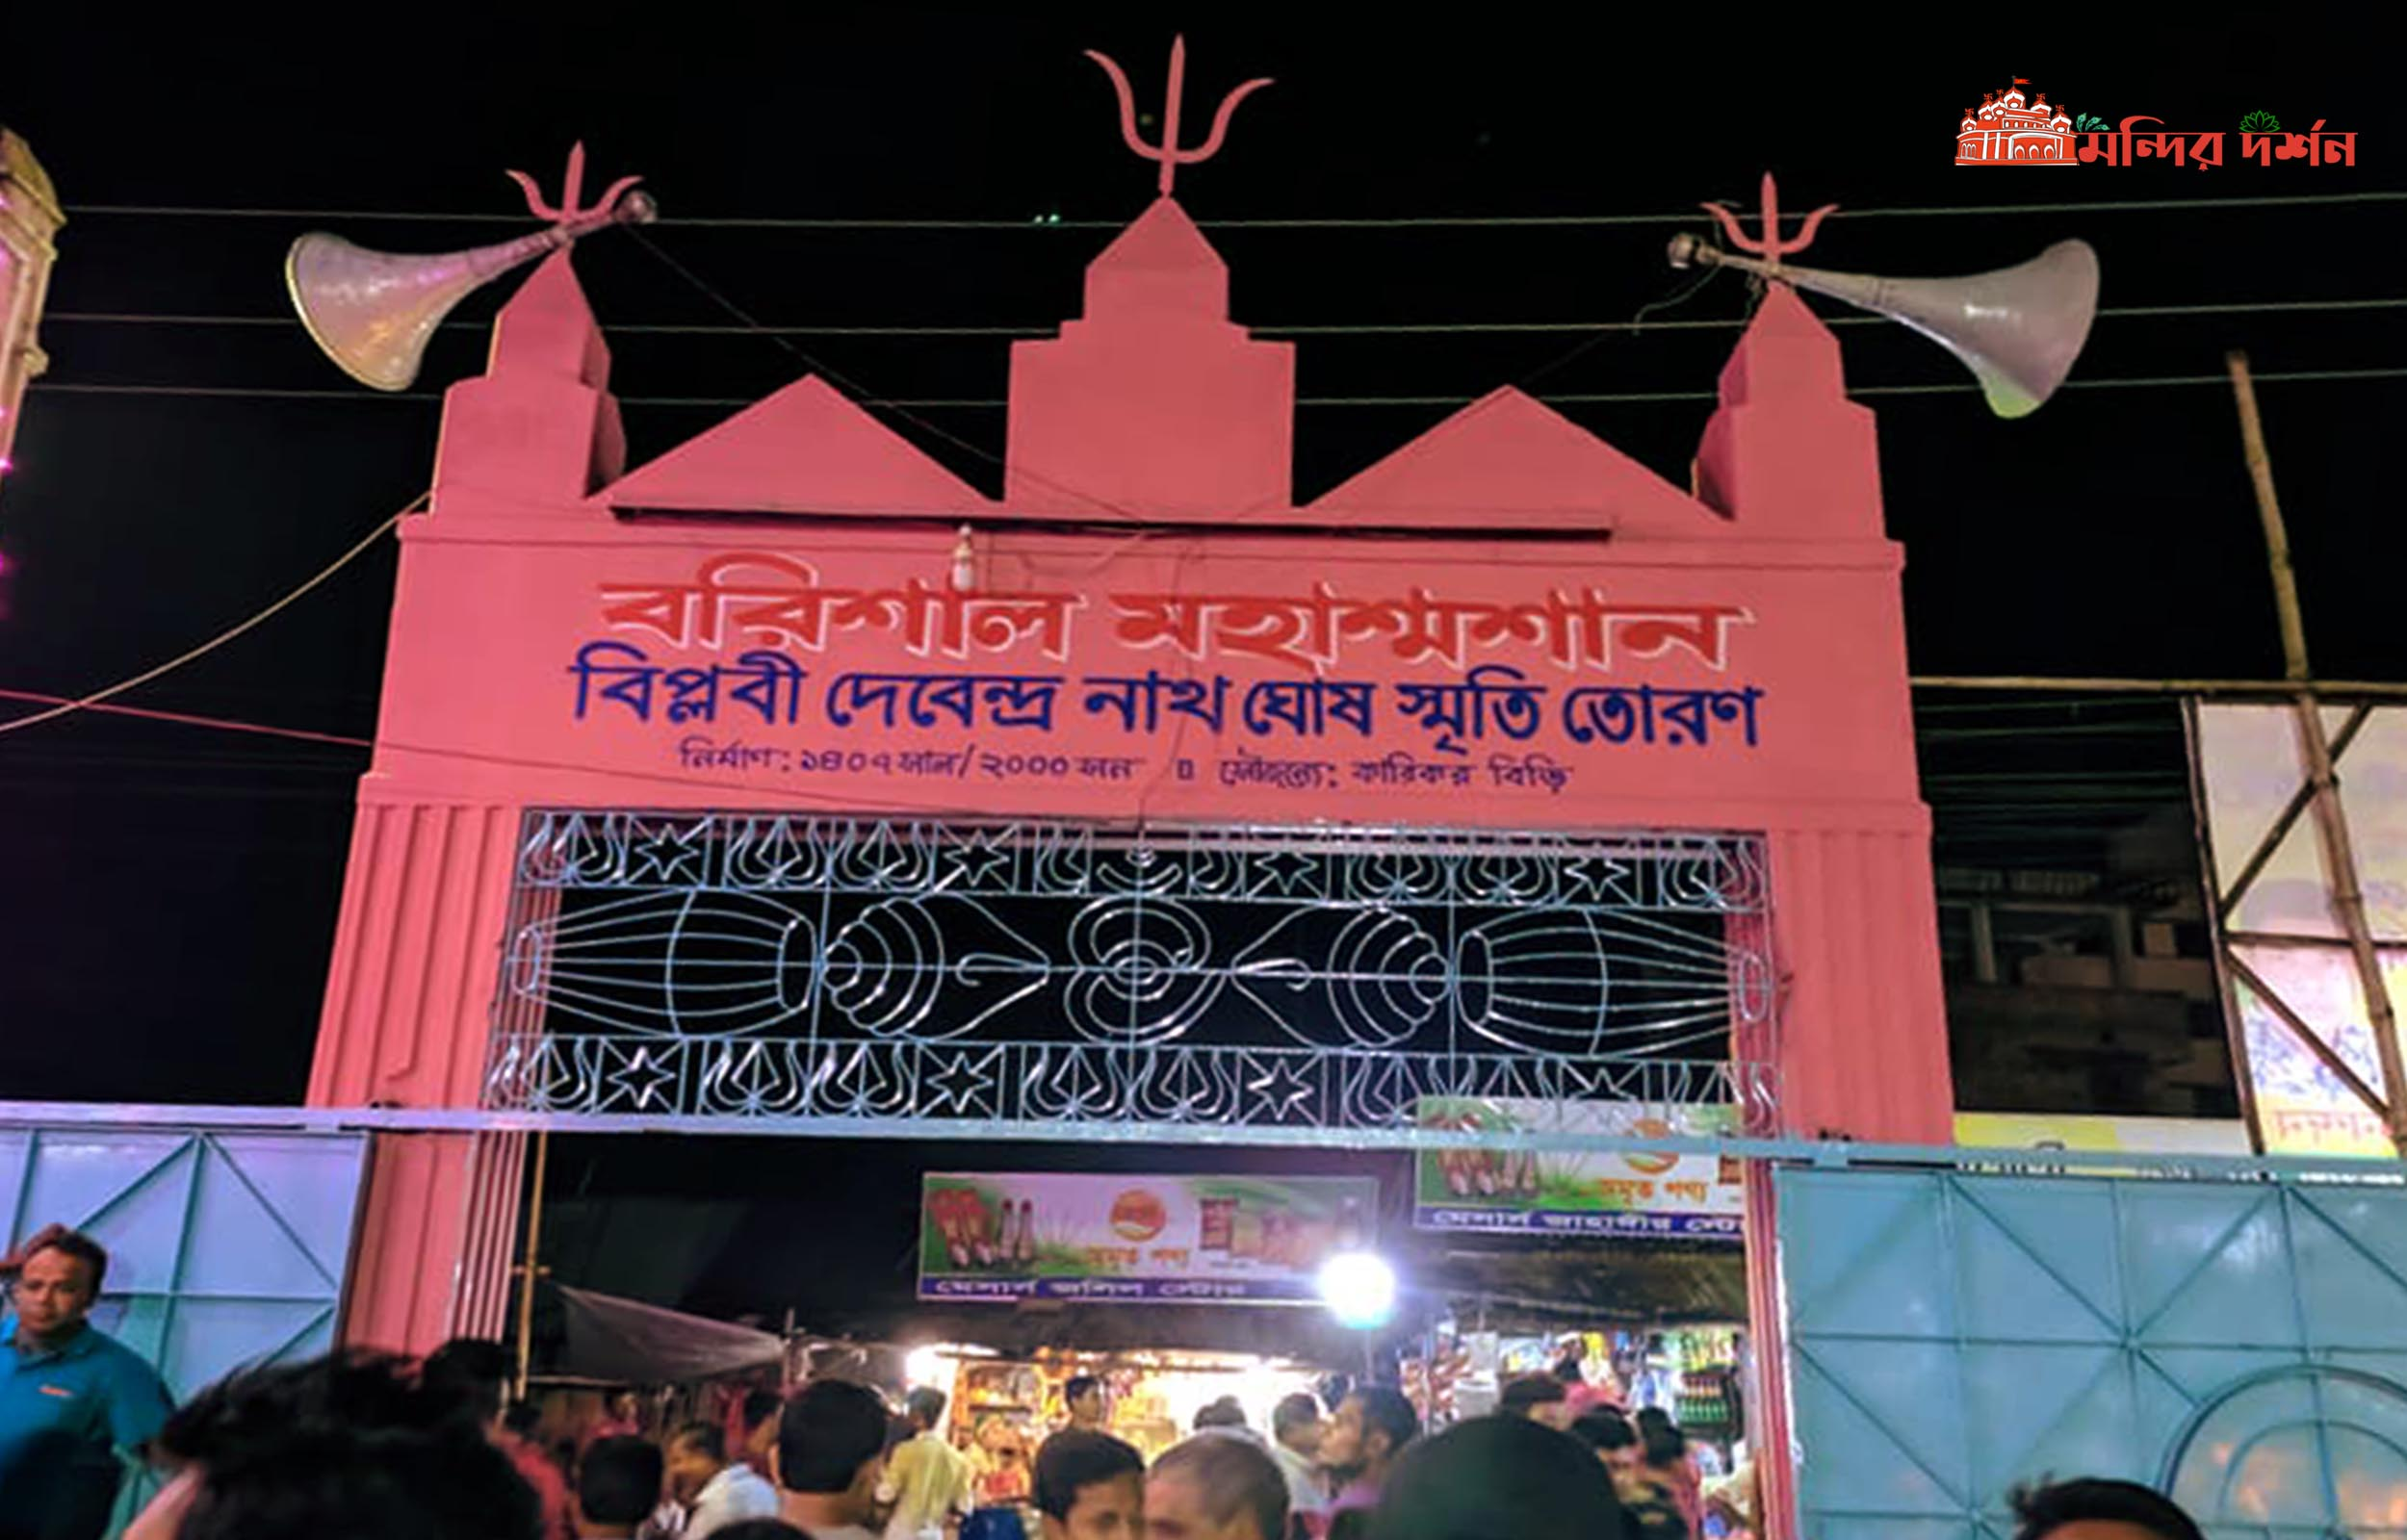 Barishal mohasasman